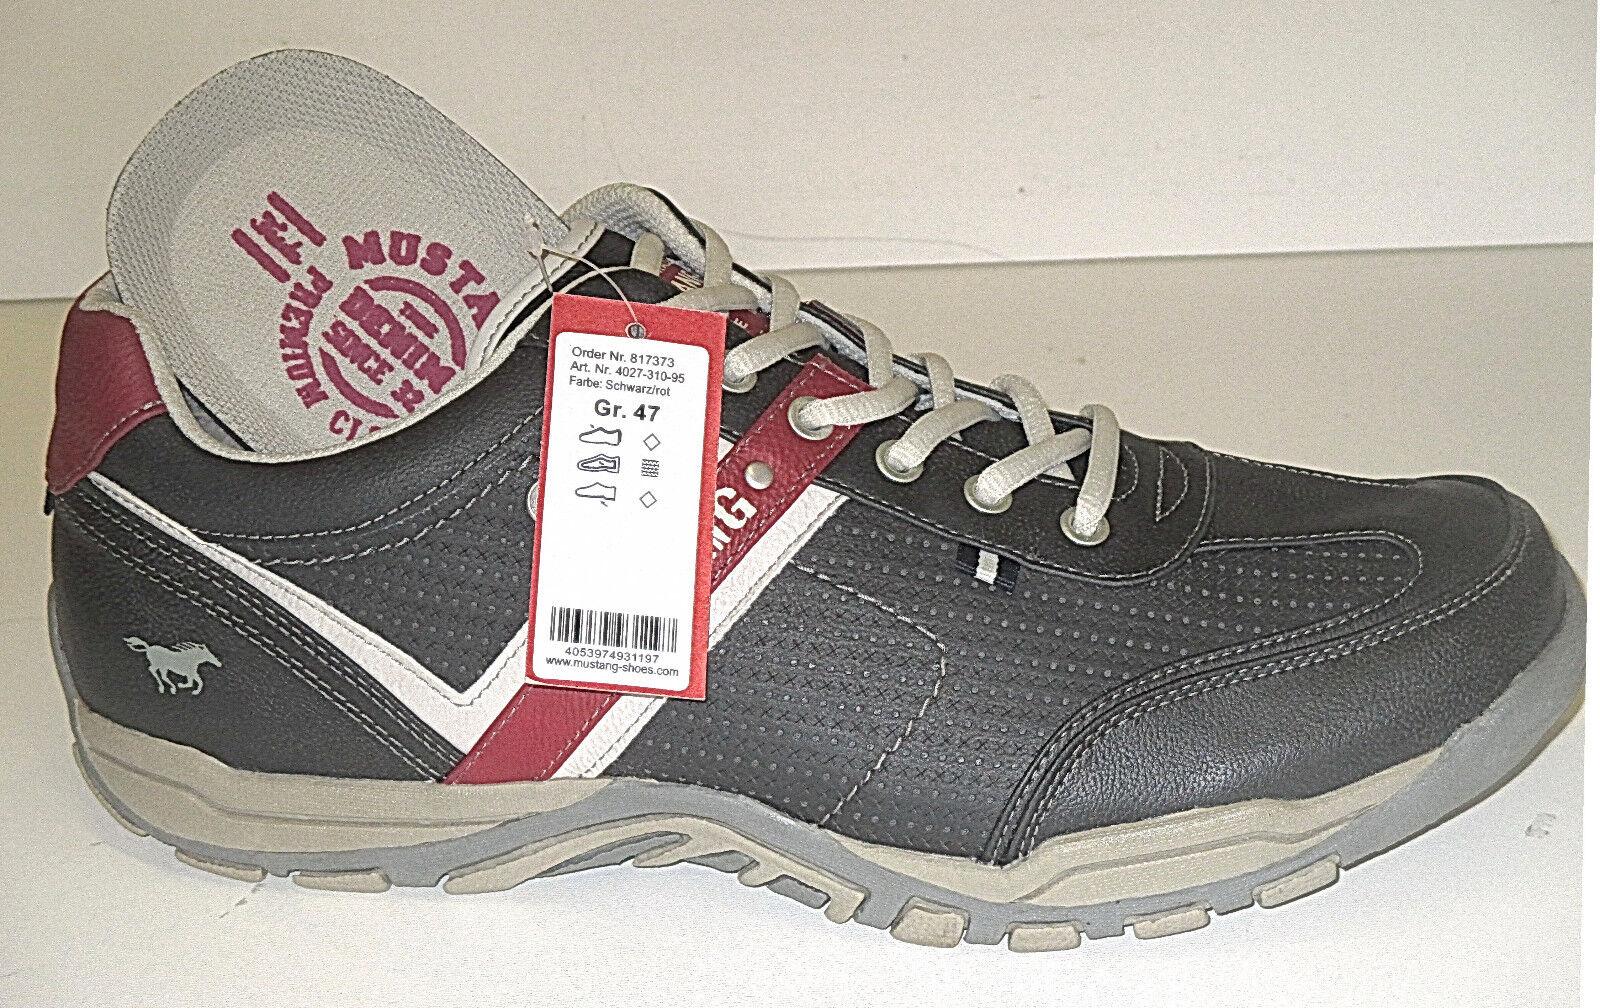 Mustang Herren Schuhe Sneakers, Art. 4027-310-95. IN ÜBBERGRÖßE  +++NEU+++